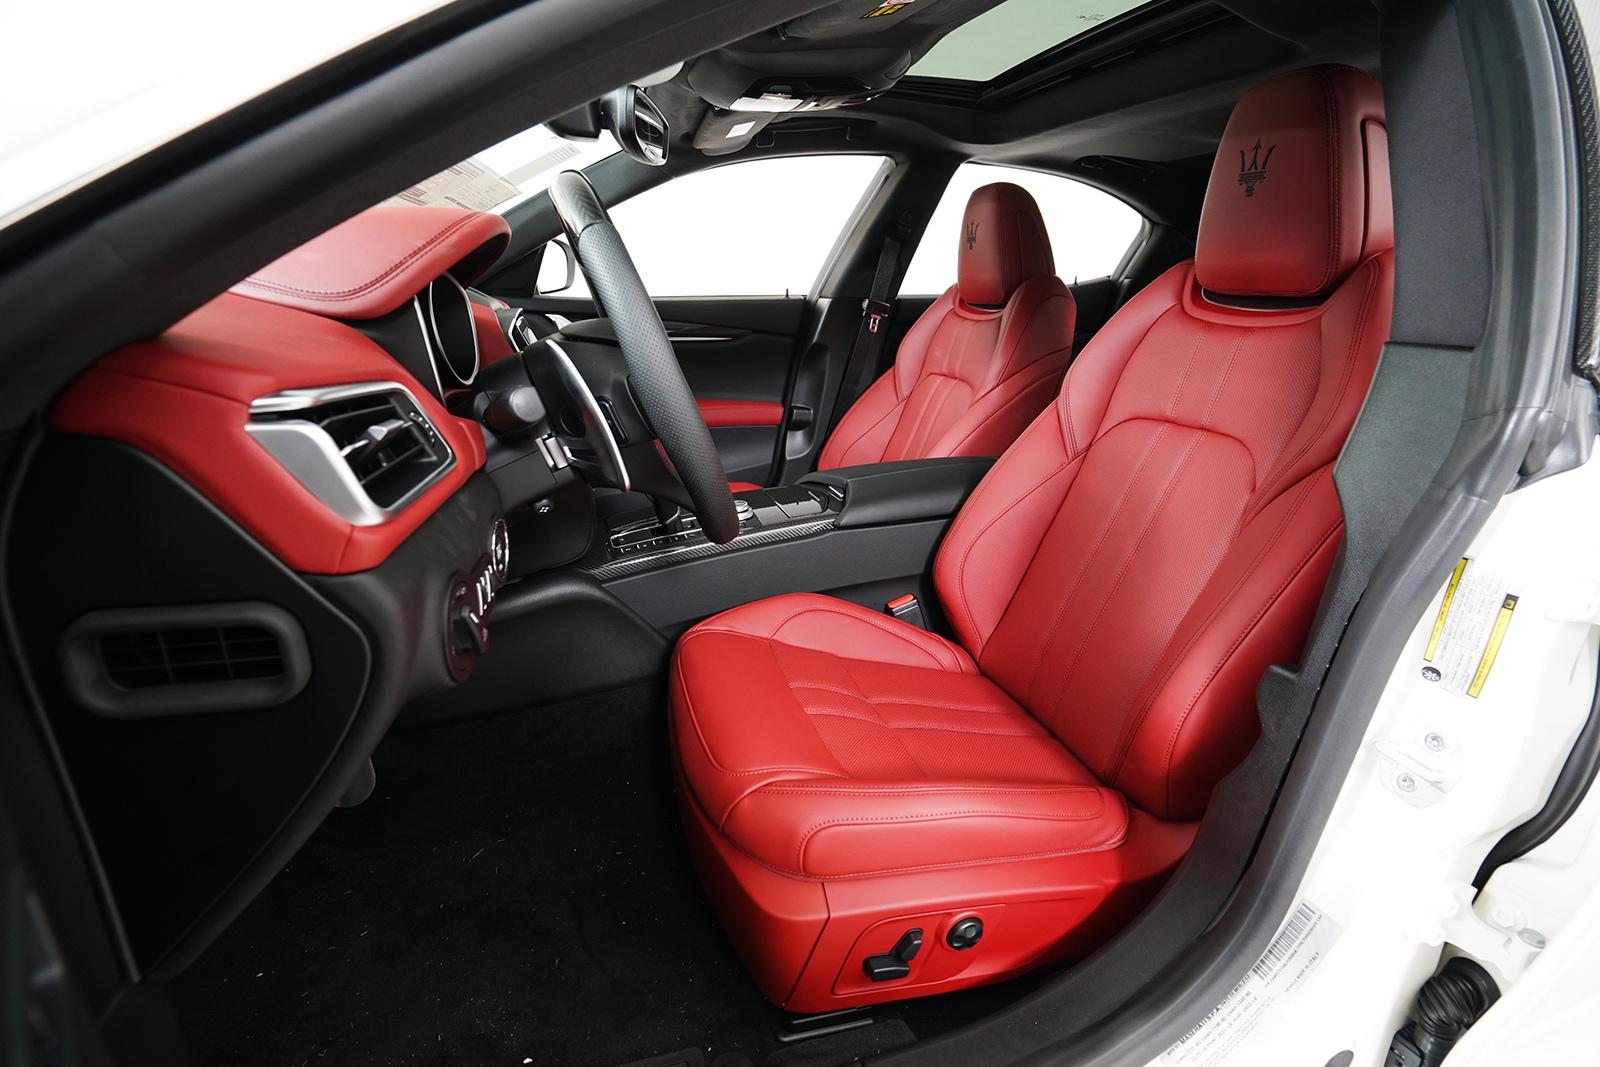 ... 2018 MASERATI GHIBLI S Q4 GranSport Sedan For Sale In Plainview, NY At  Maserati Of ...